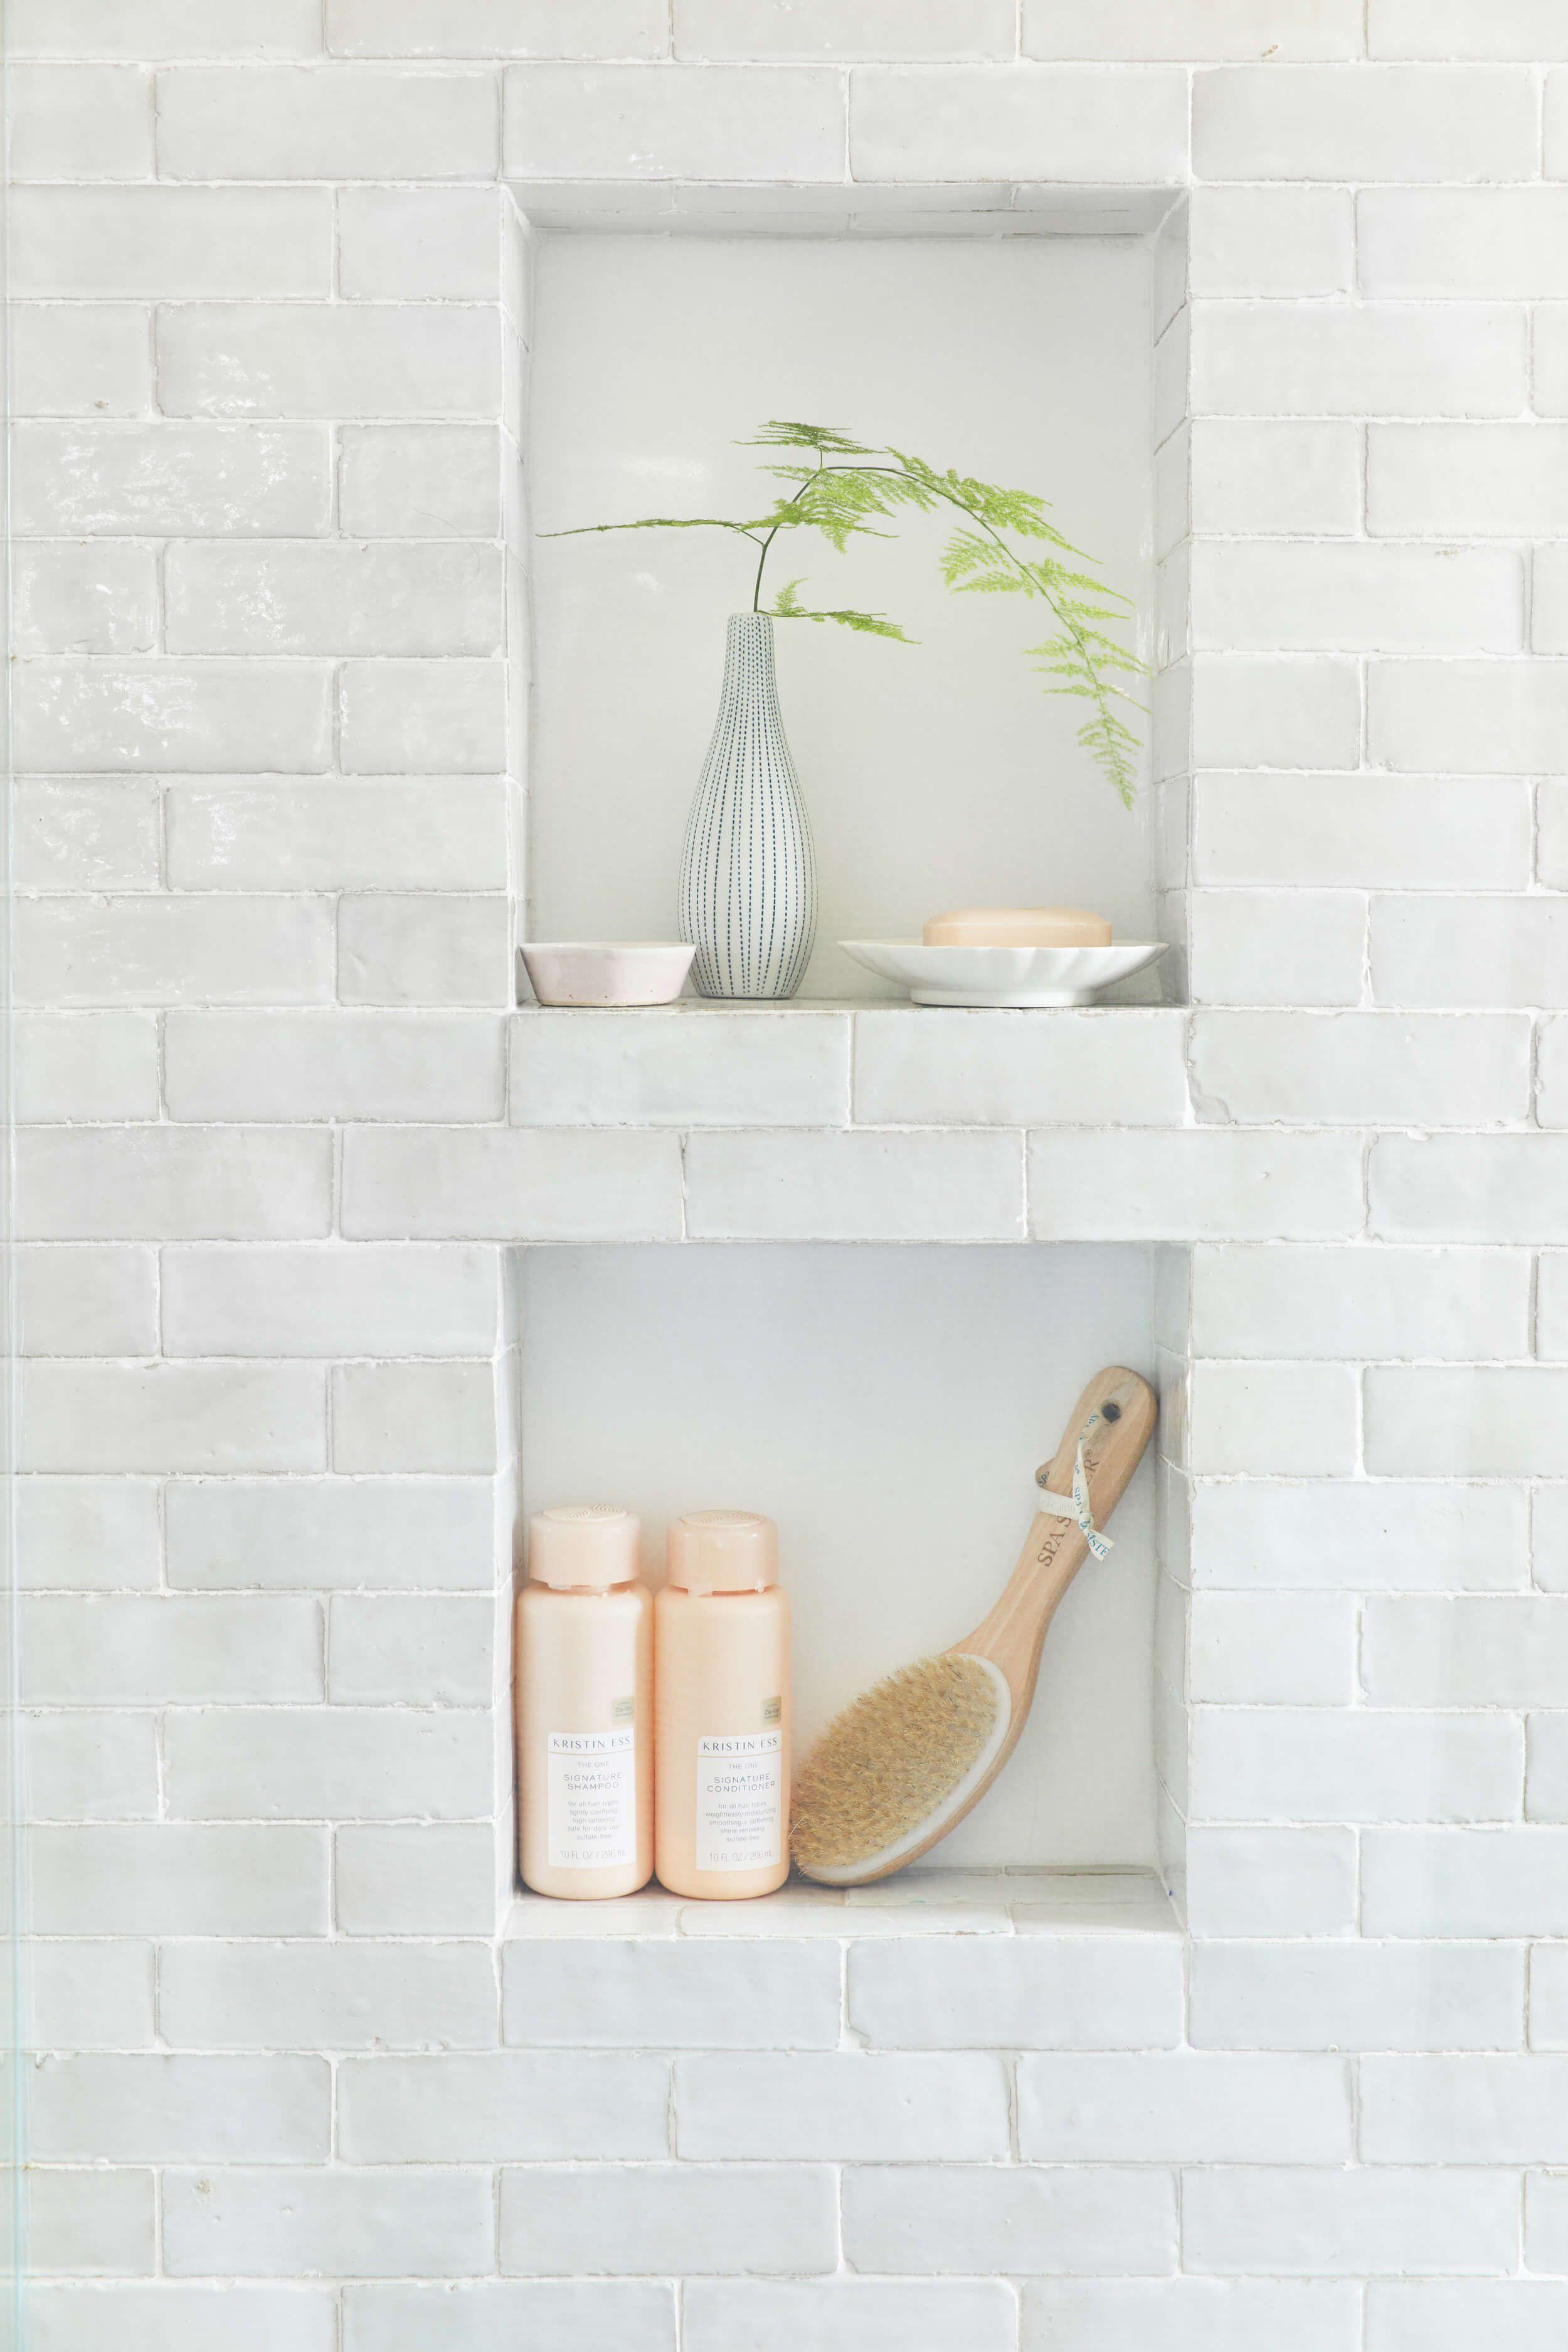 Weathered White Zellige 2 X6 X3 4 Subway Modern Master Bathroom Restroom Remodel Bathroom Interior Design